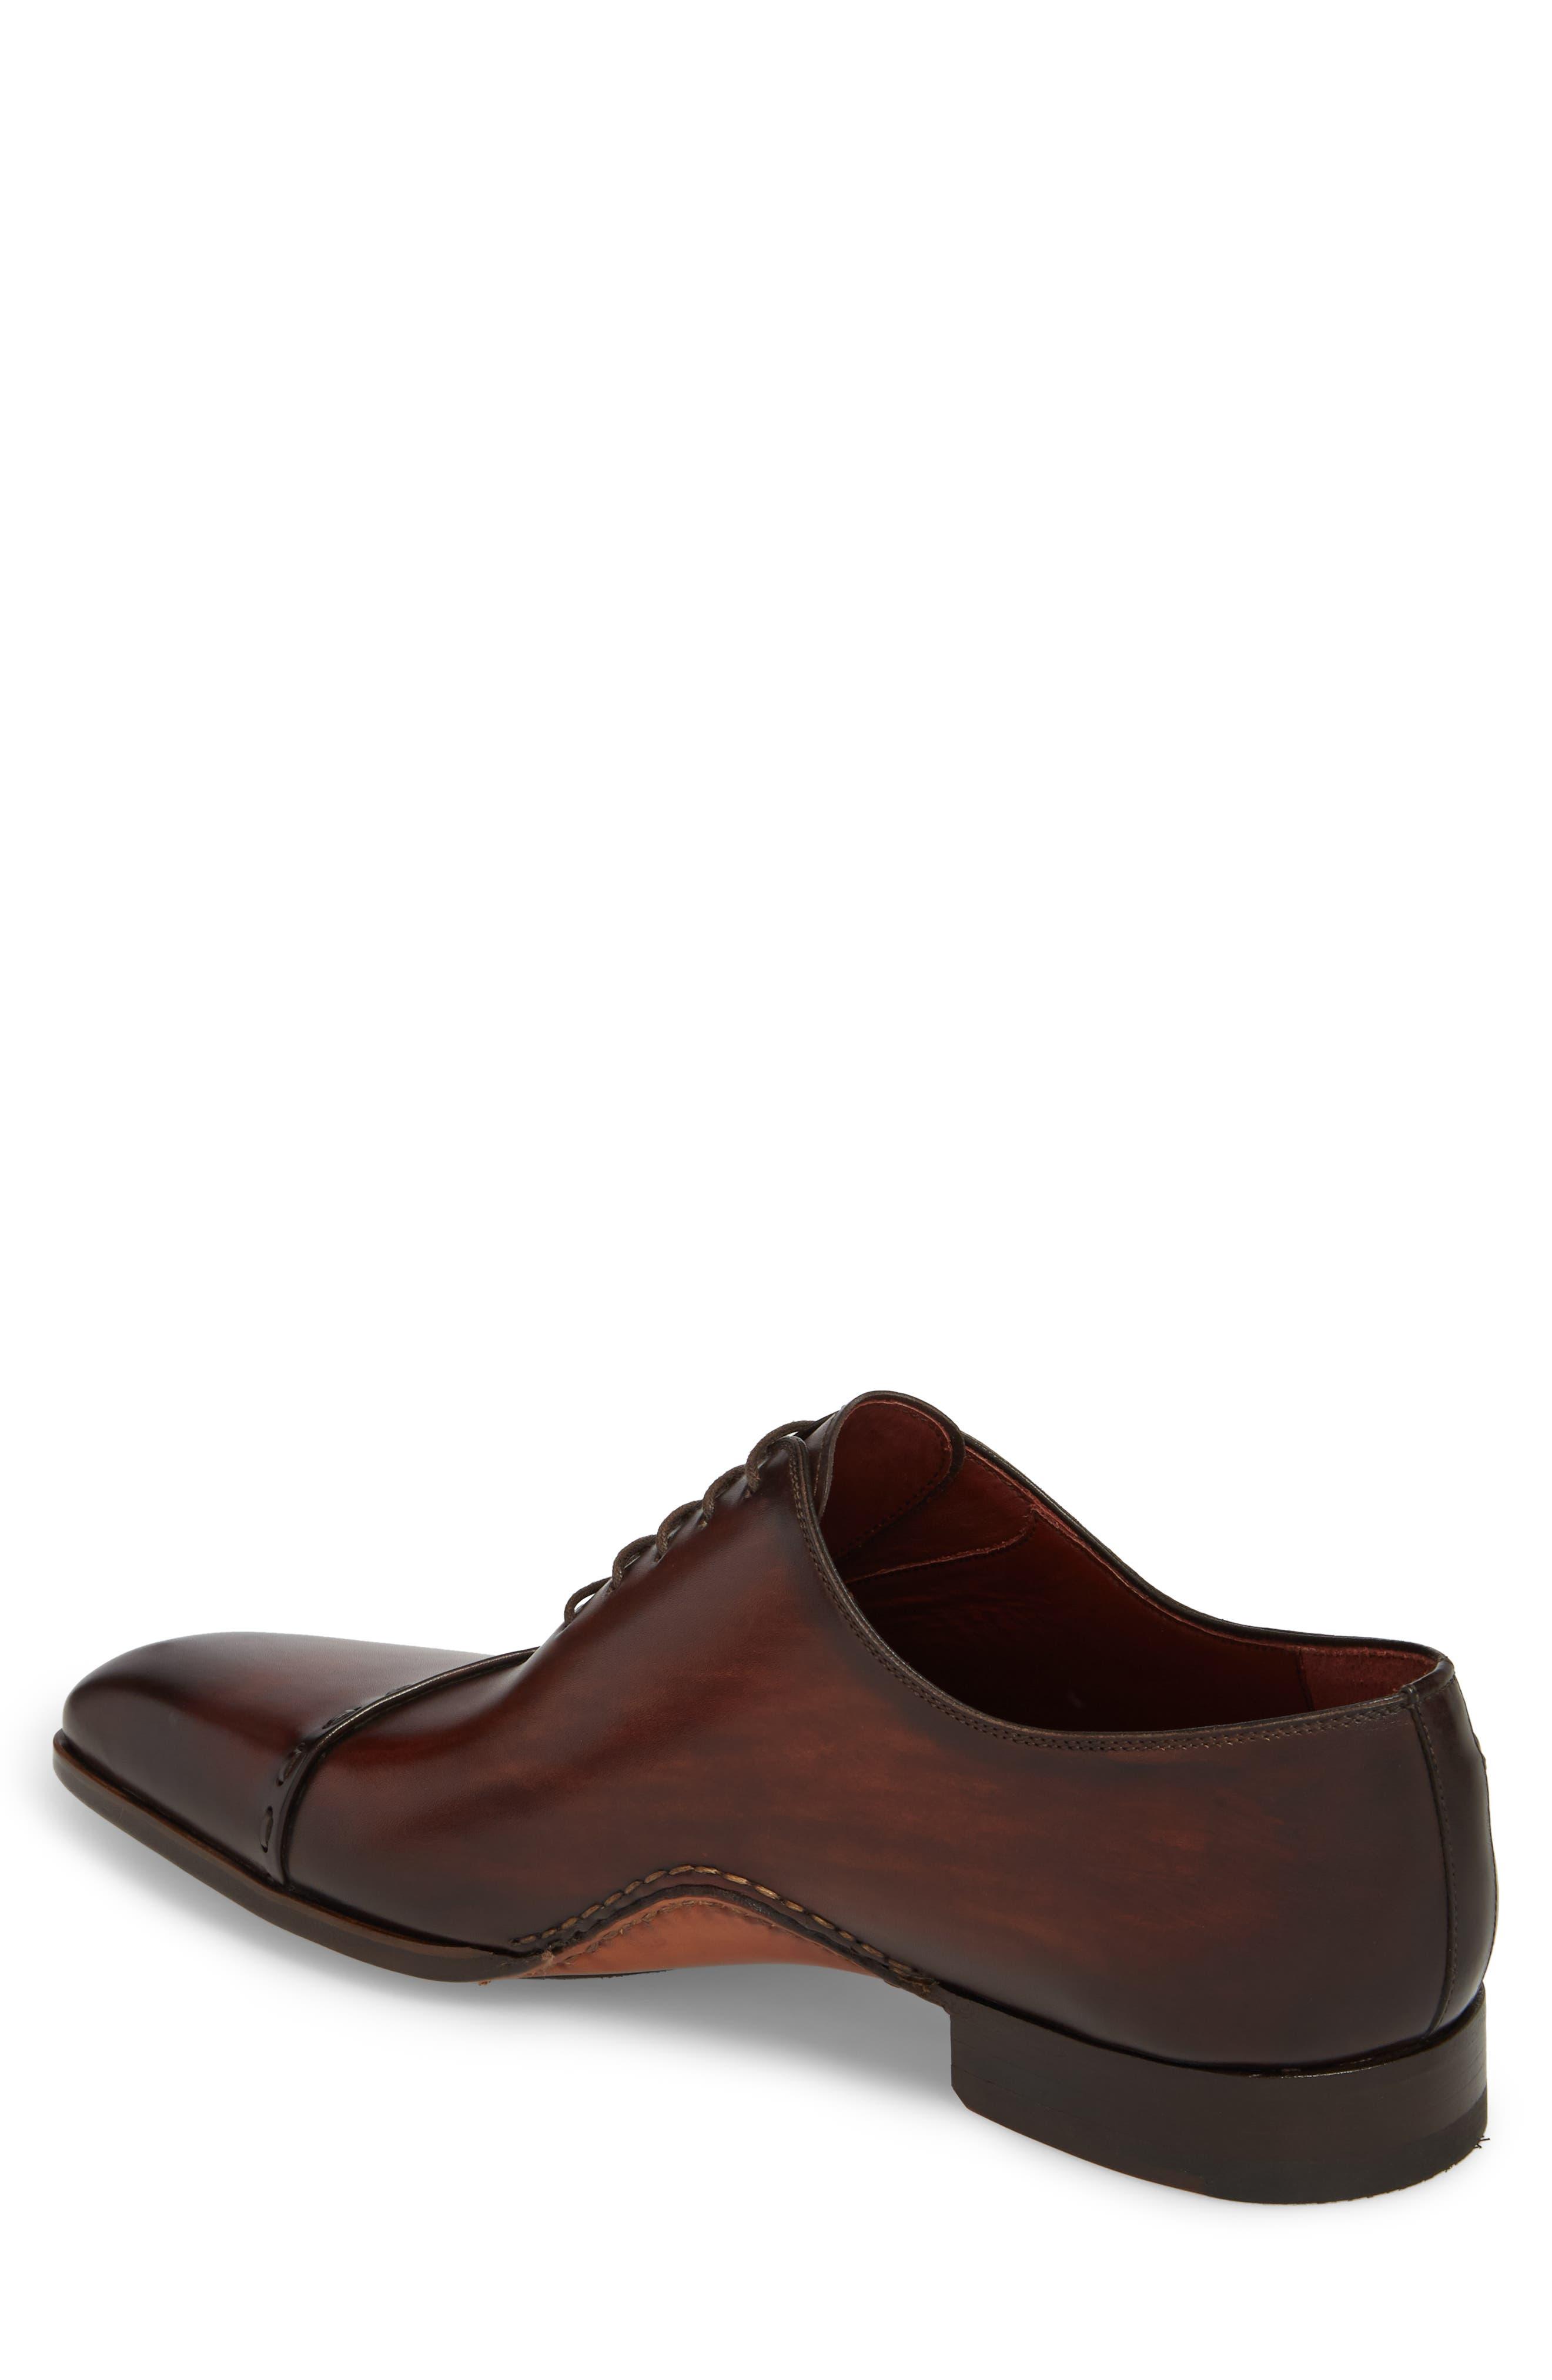 Kobe Asymmetrical Whole Cut Shoe,                             Alternate thumbnail 2, color,                             Mid-Brown Leather